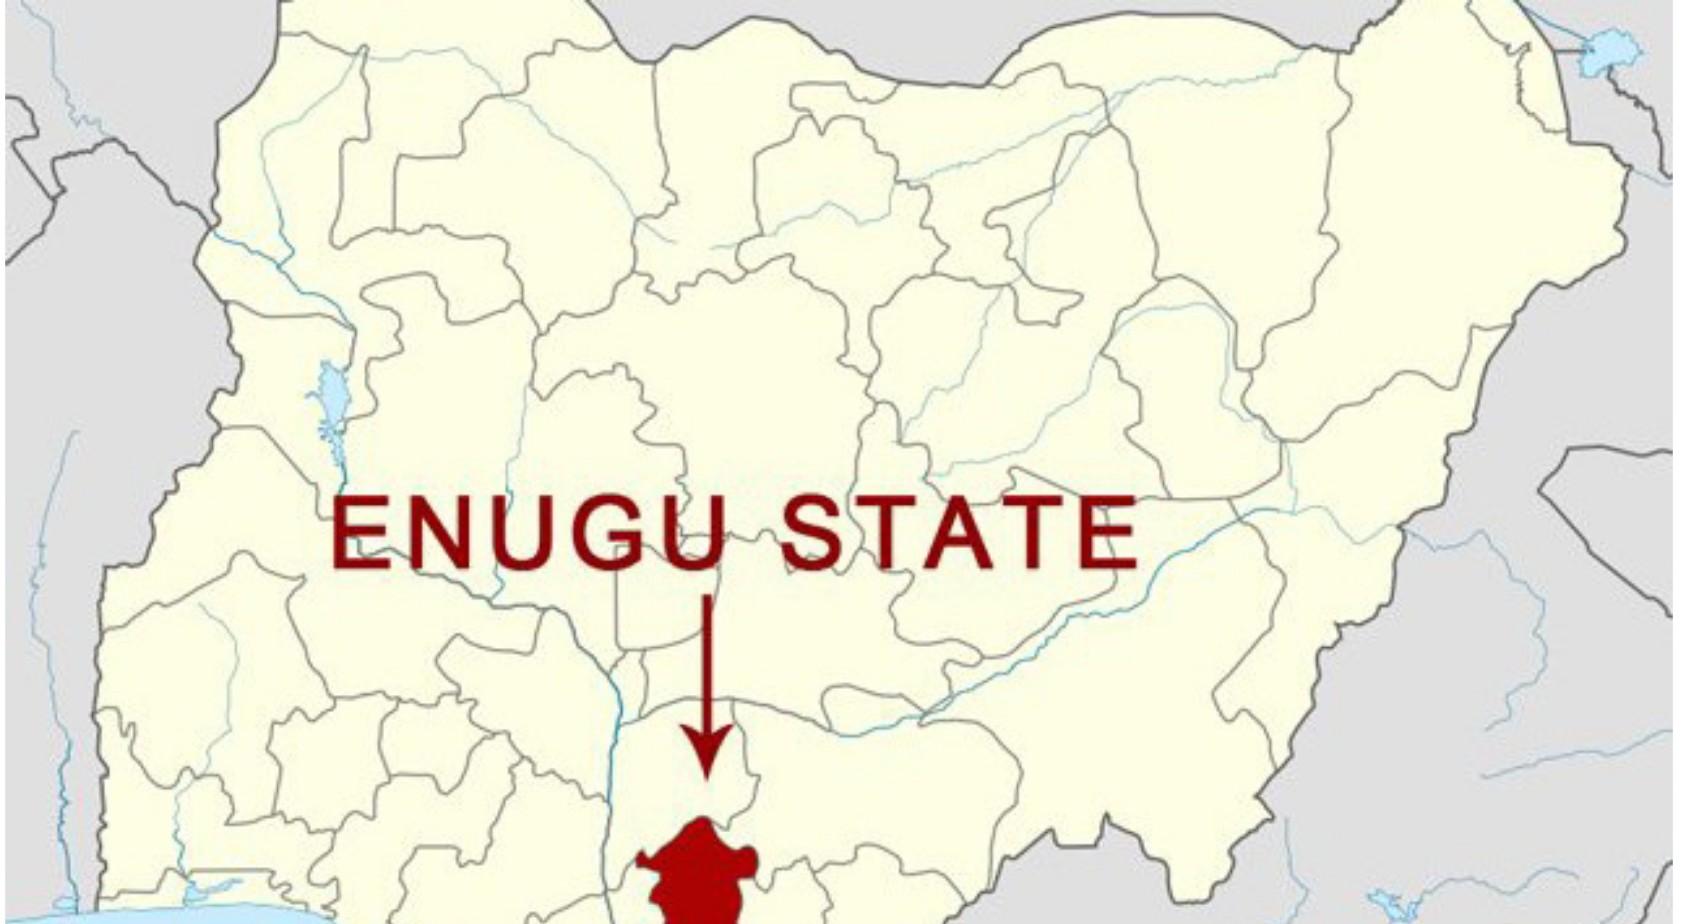 Ex-Enugu SSG, Professor Ukpabi is dead